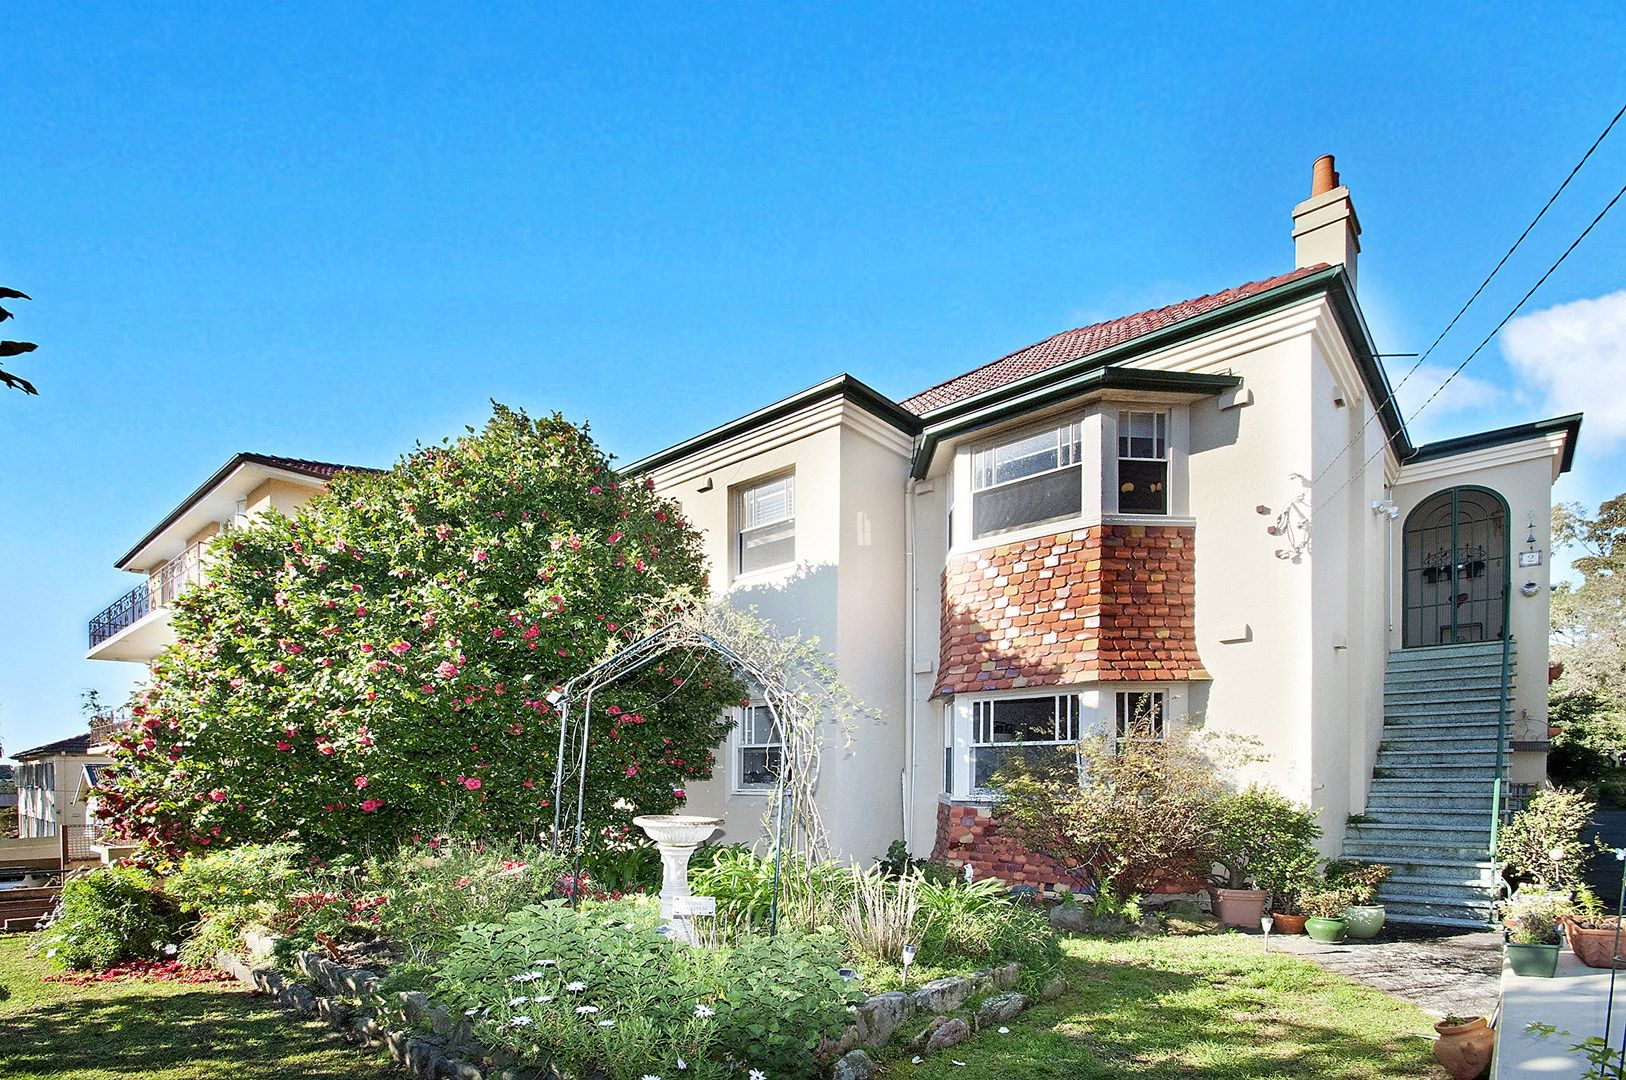 2/82 Wanganella Street, Balgowlah NSW 2093, Image 0